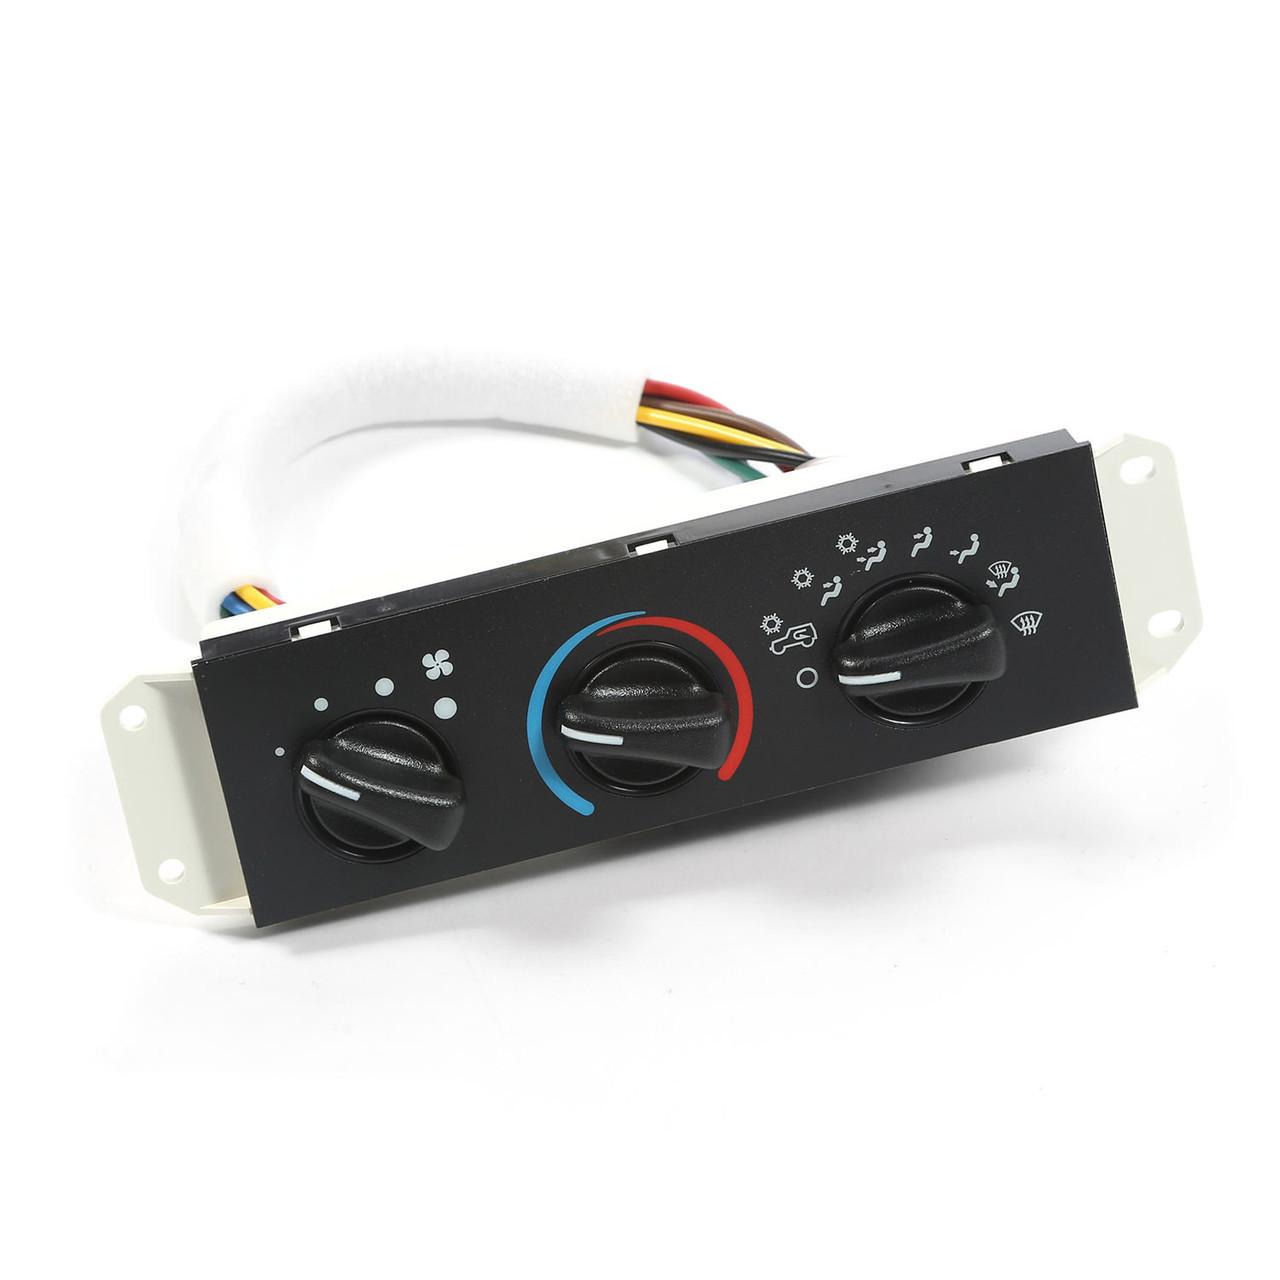 Heater Control Blower Motor Switch Heat Jeep Wrangler Tj 1999 To 2004 17903.04